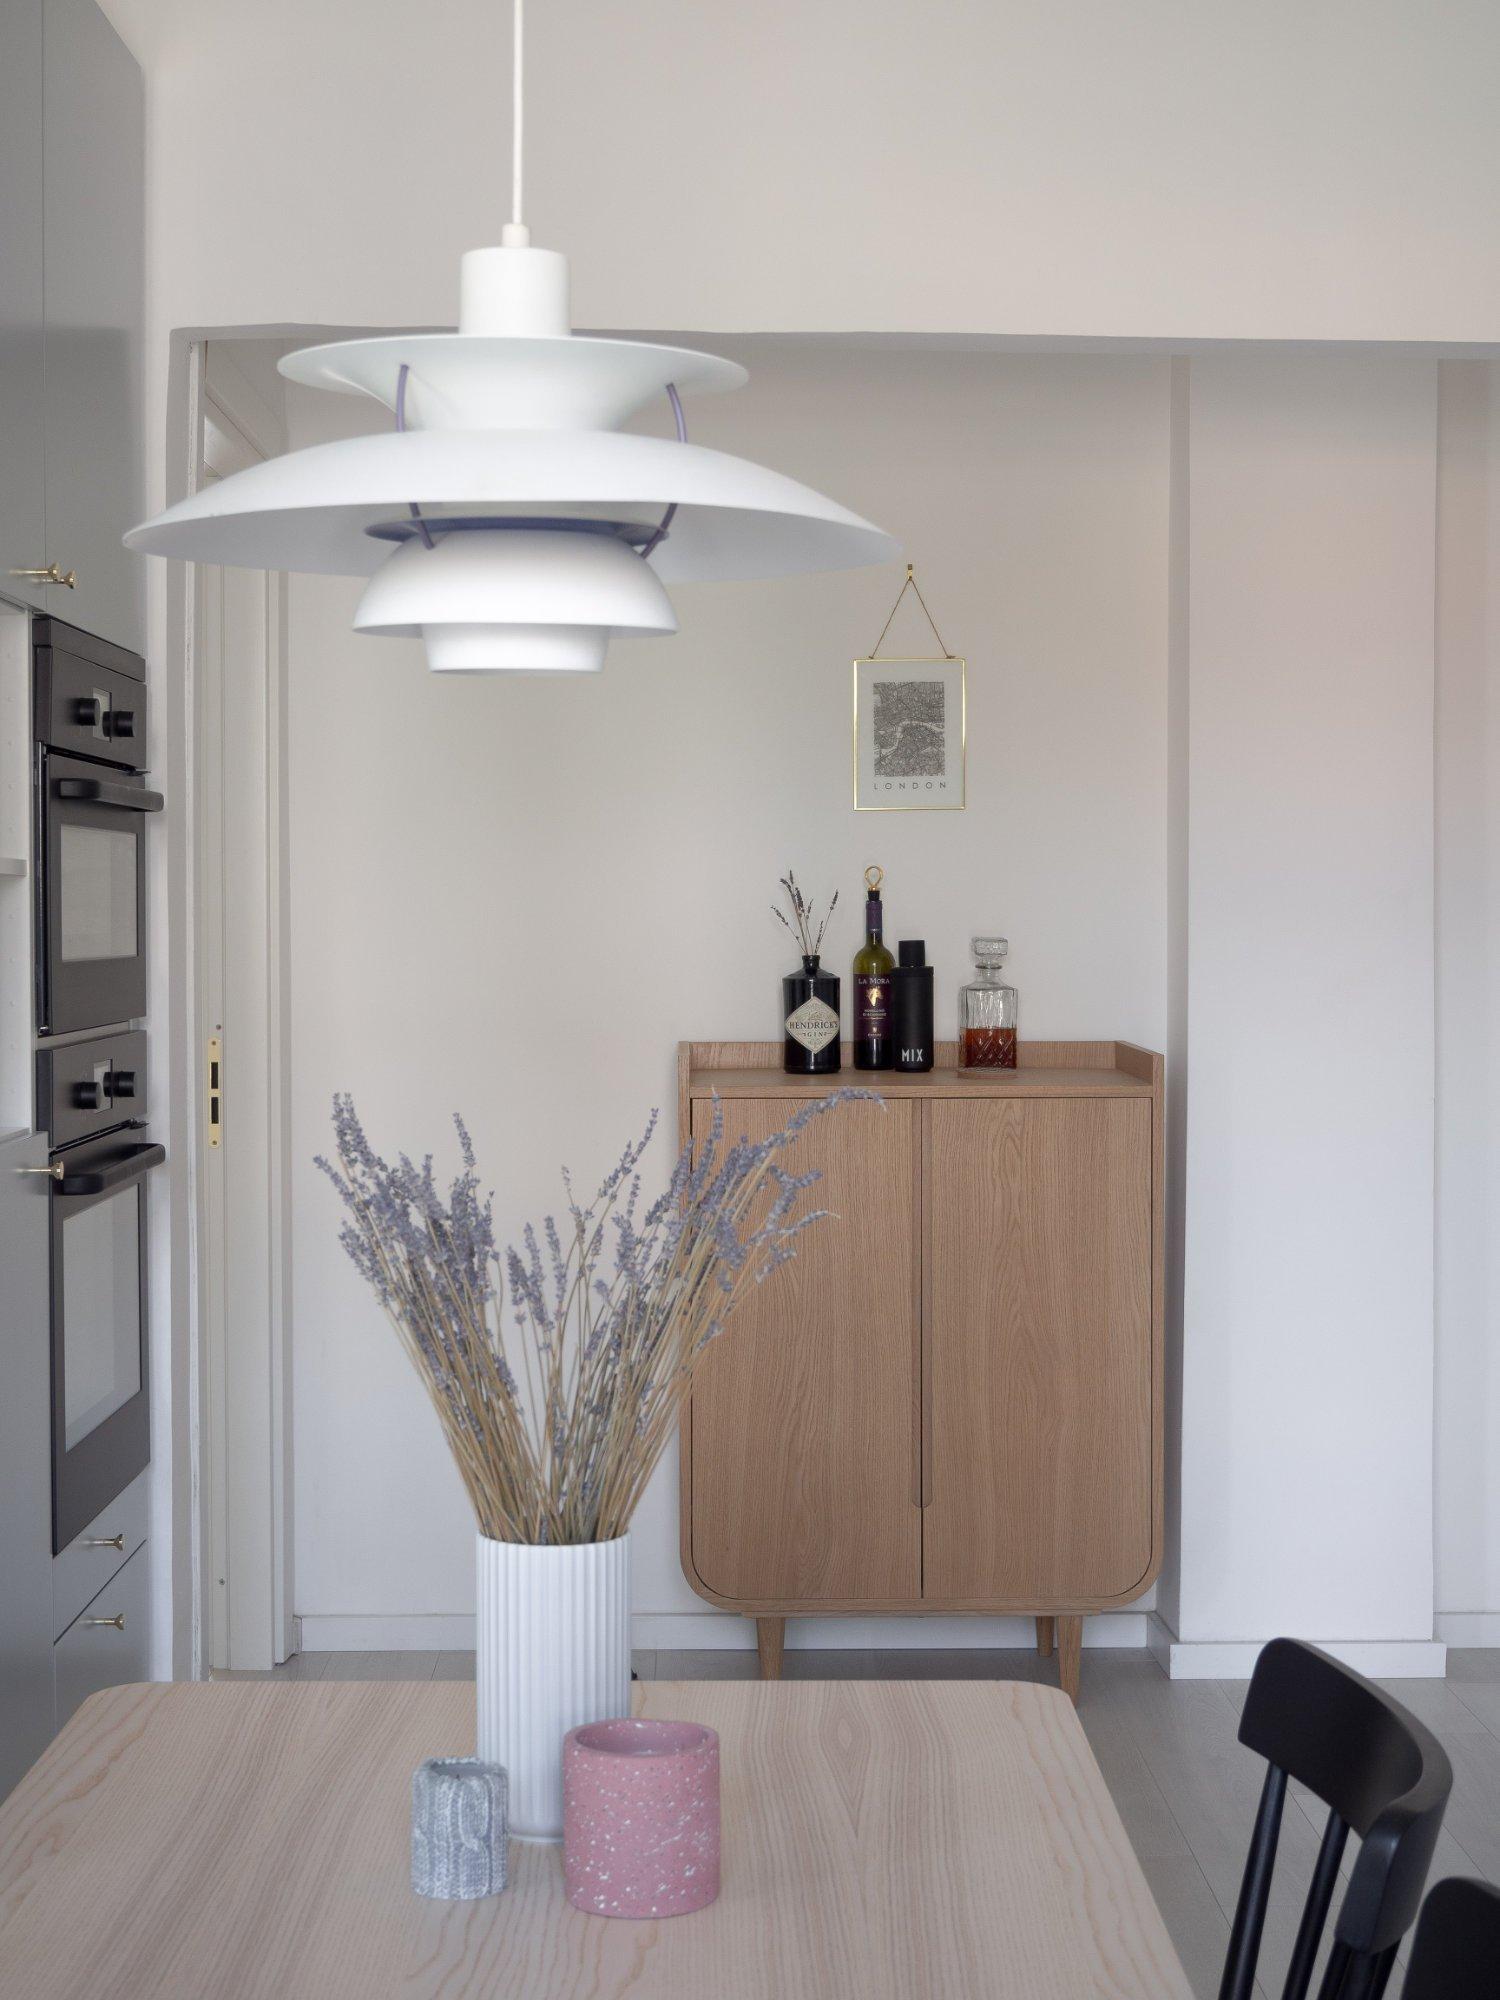 That Scandinavian Feeling Home Tour kitchen bar cabinet